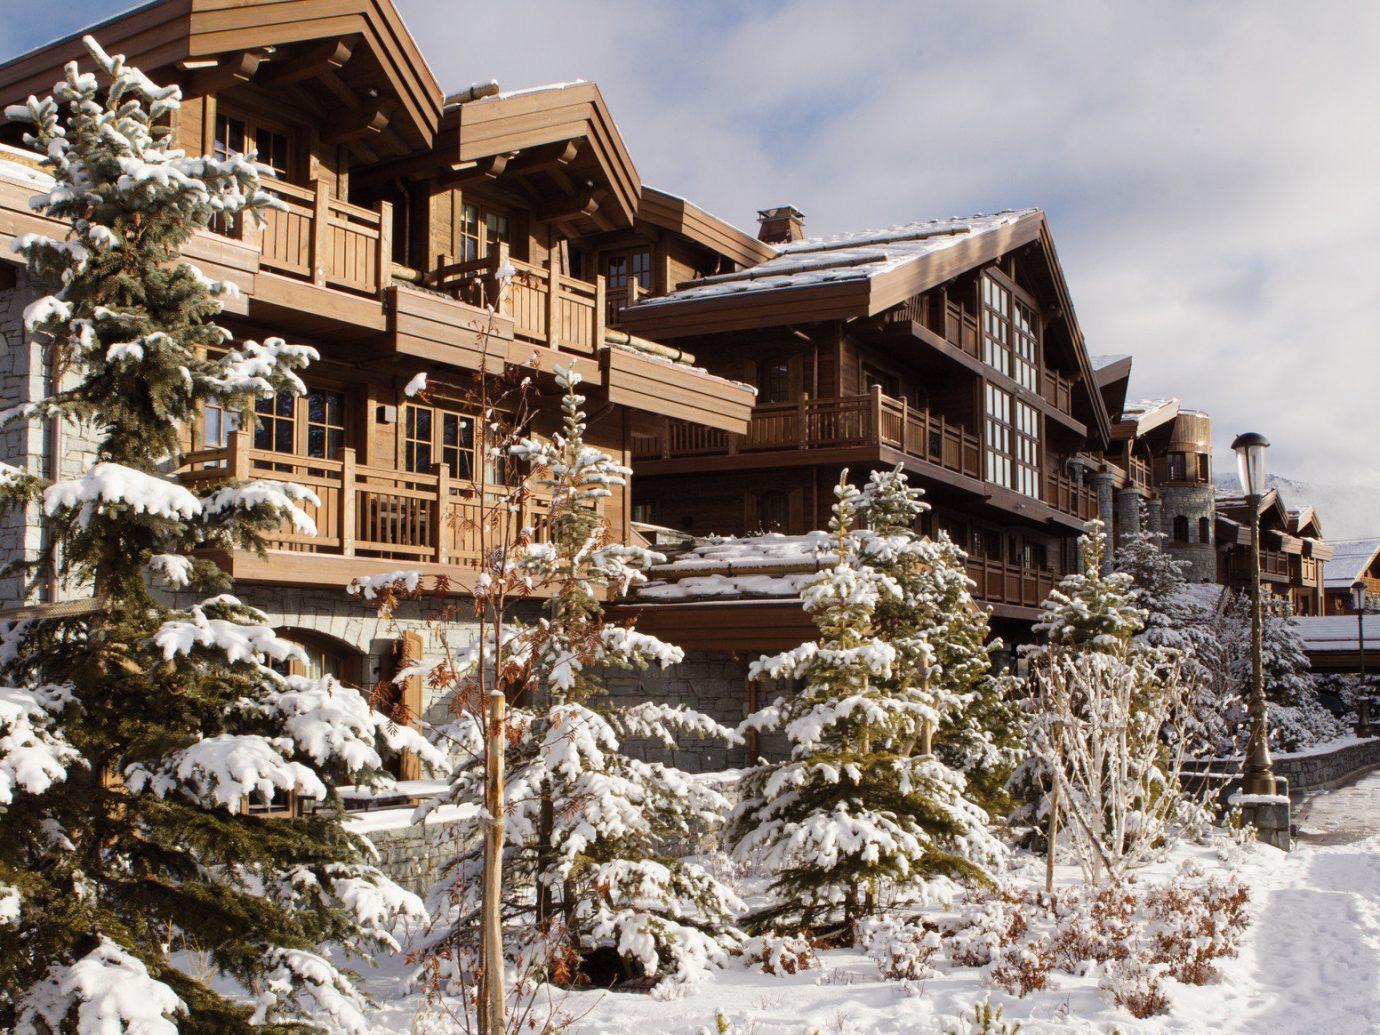 building Cabin Exterior Greenery Lodge remote Rustic ski lodge snow trees Trip Ideas Winter outdoor sky tree house geological phenomenon season Resort home